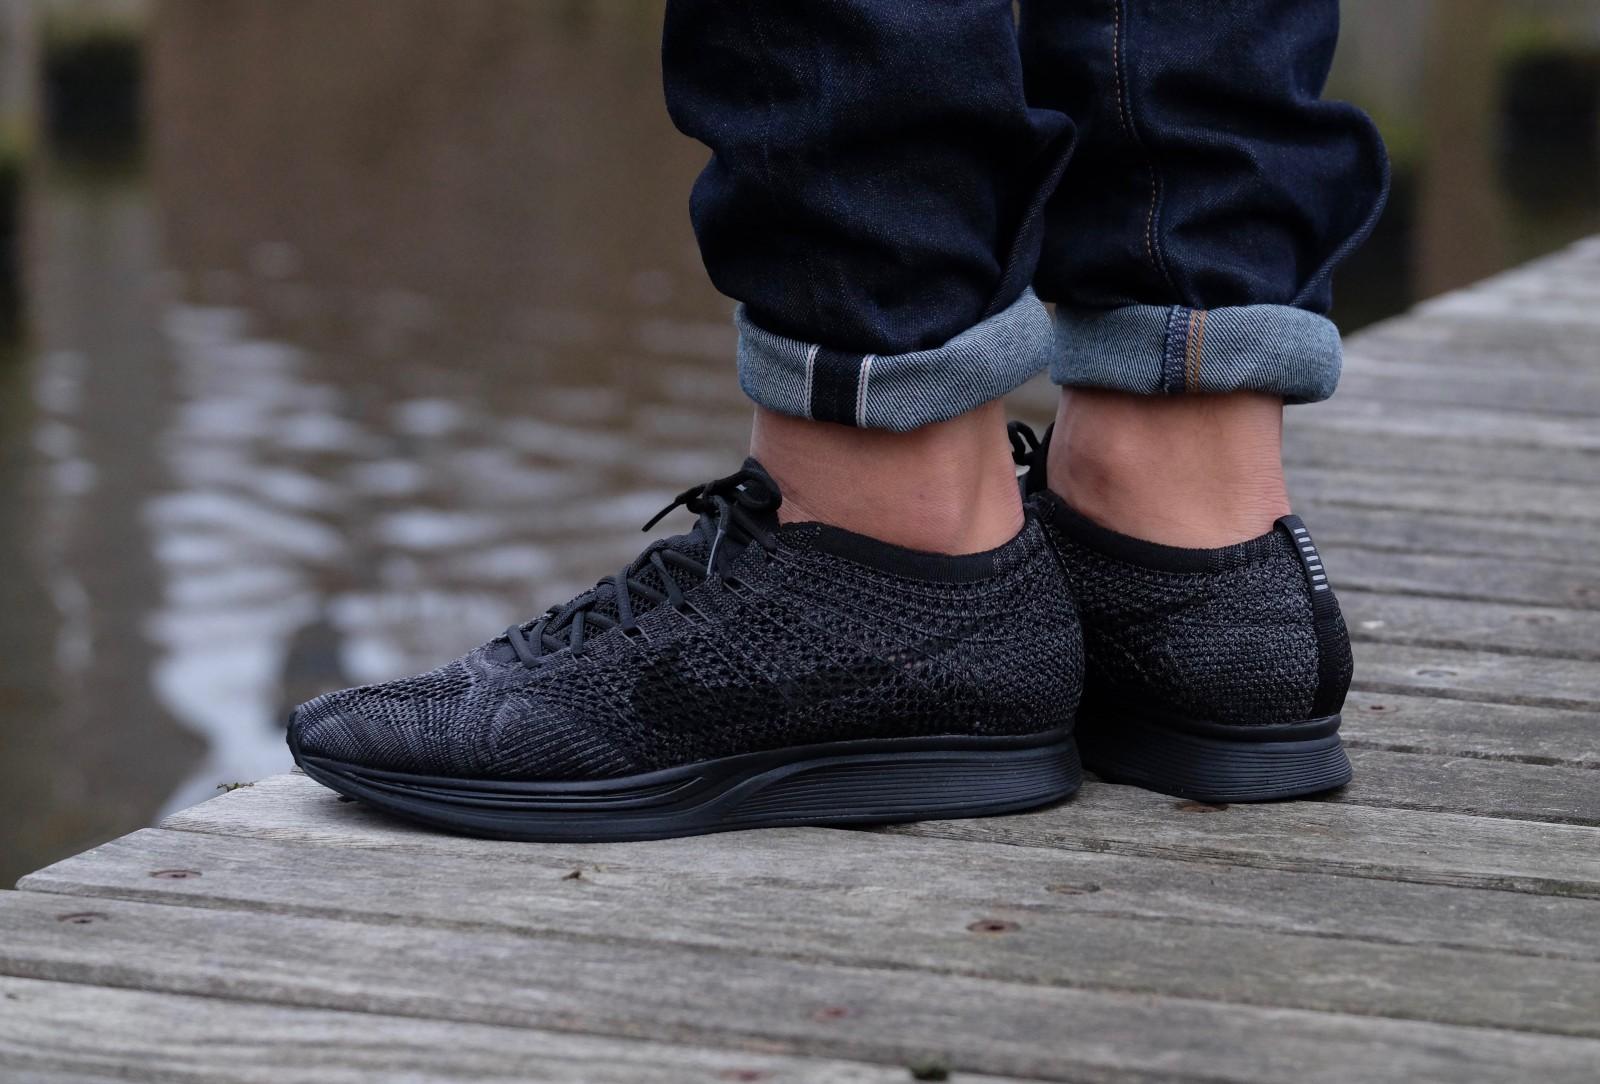 Nike Flyknit Racer Black/Black